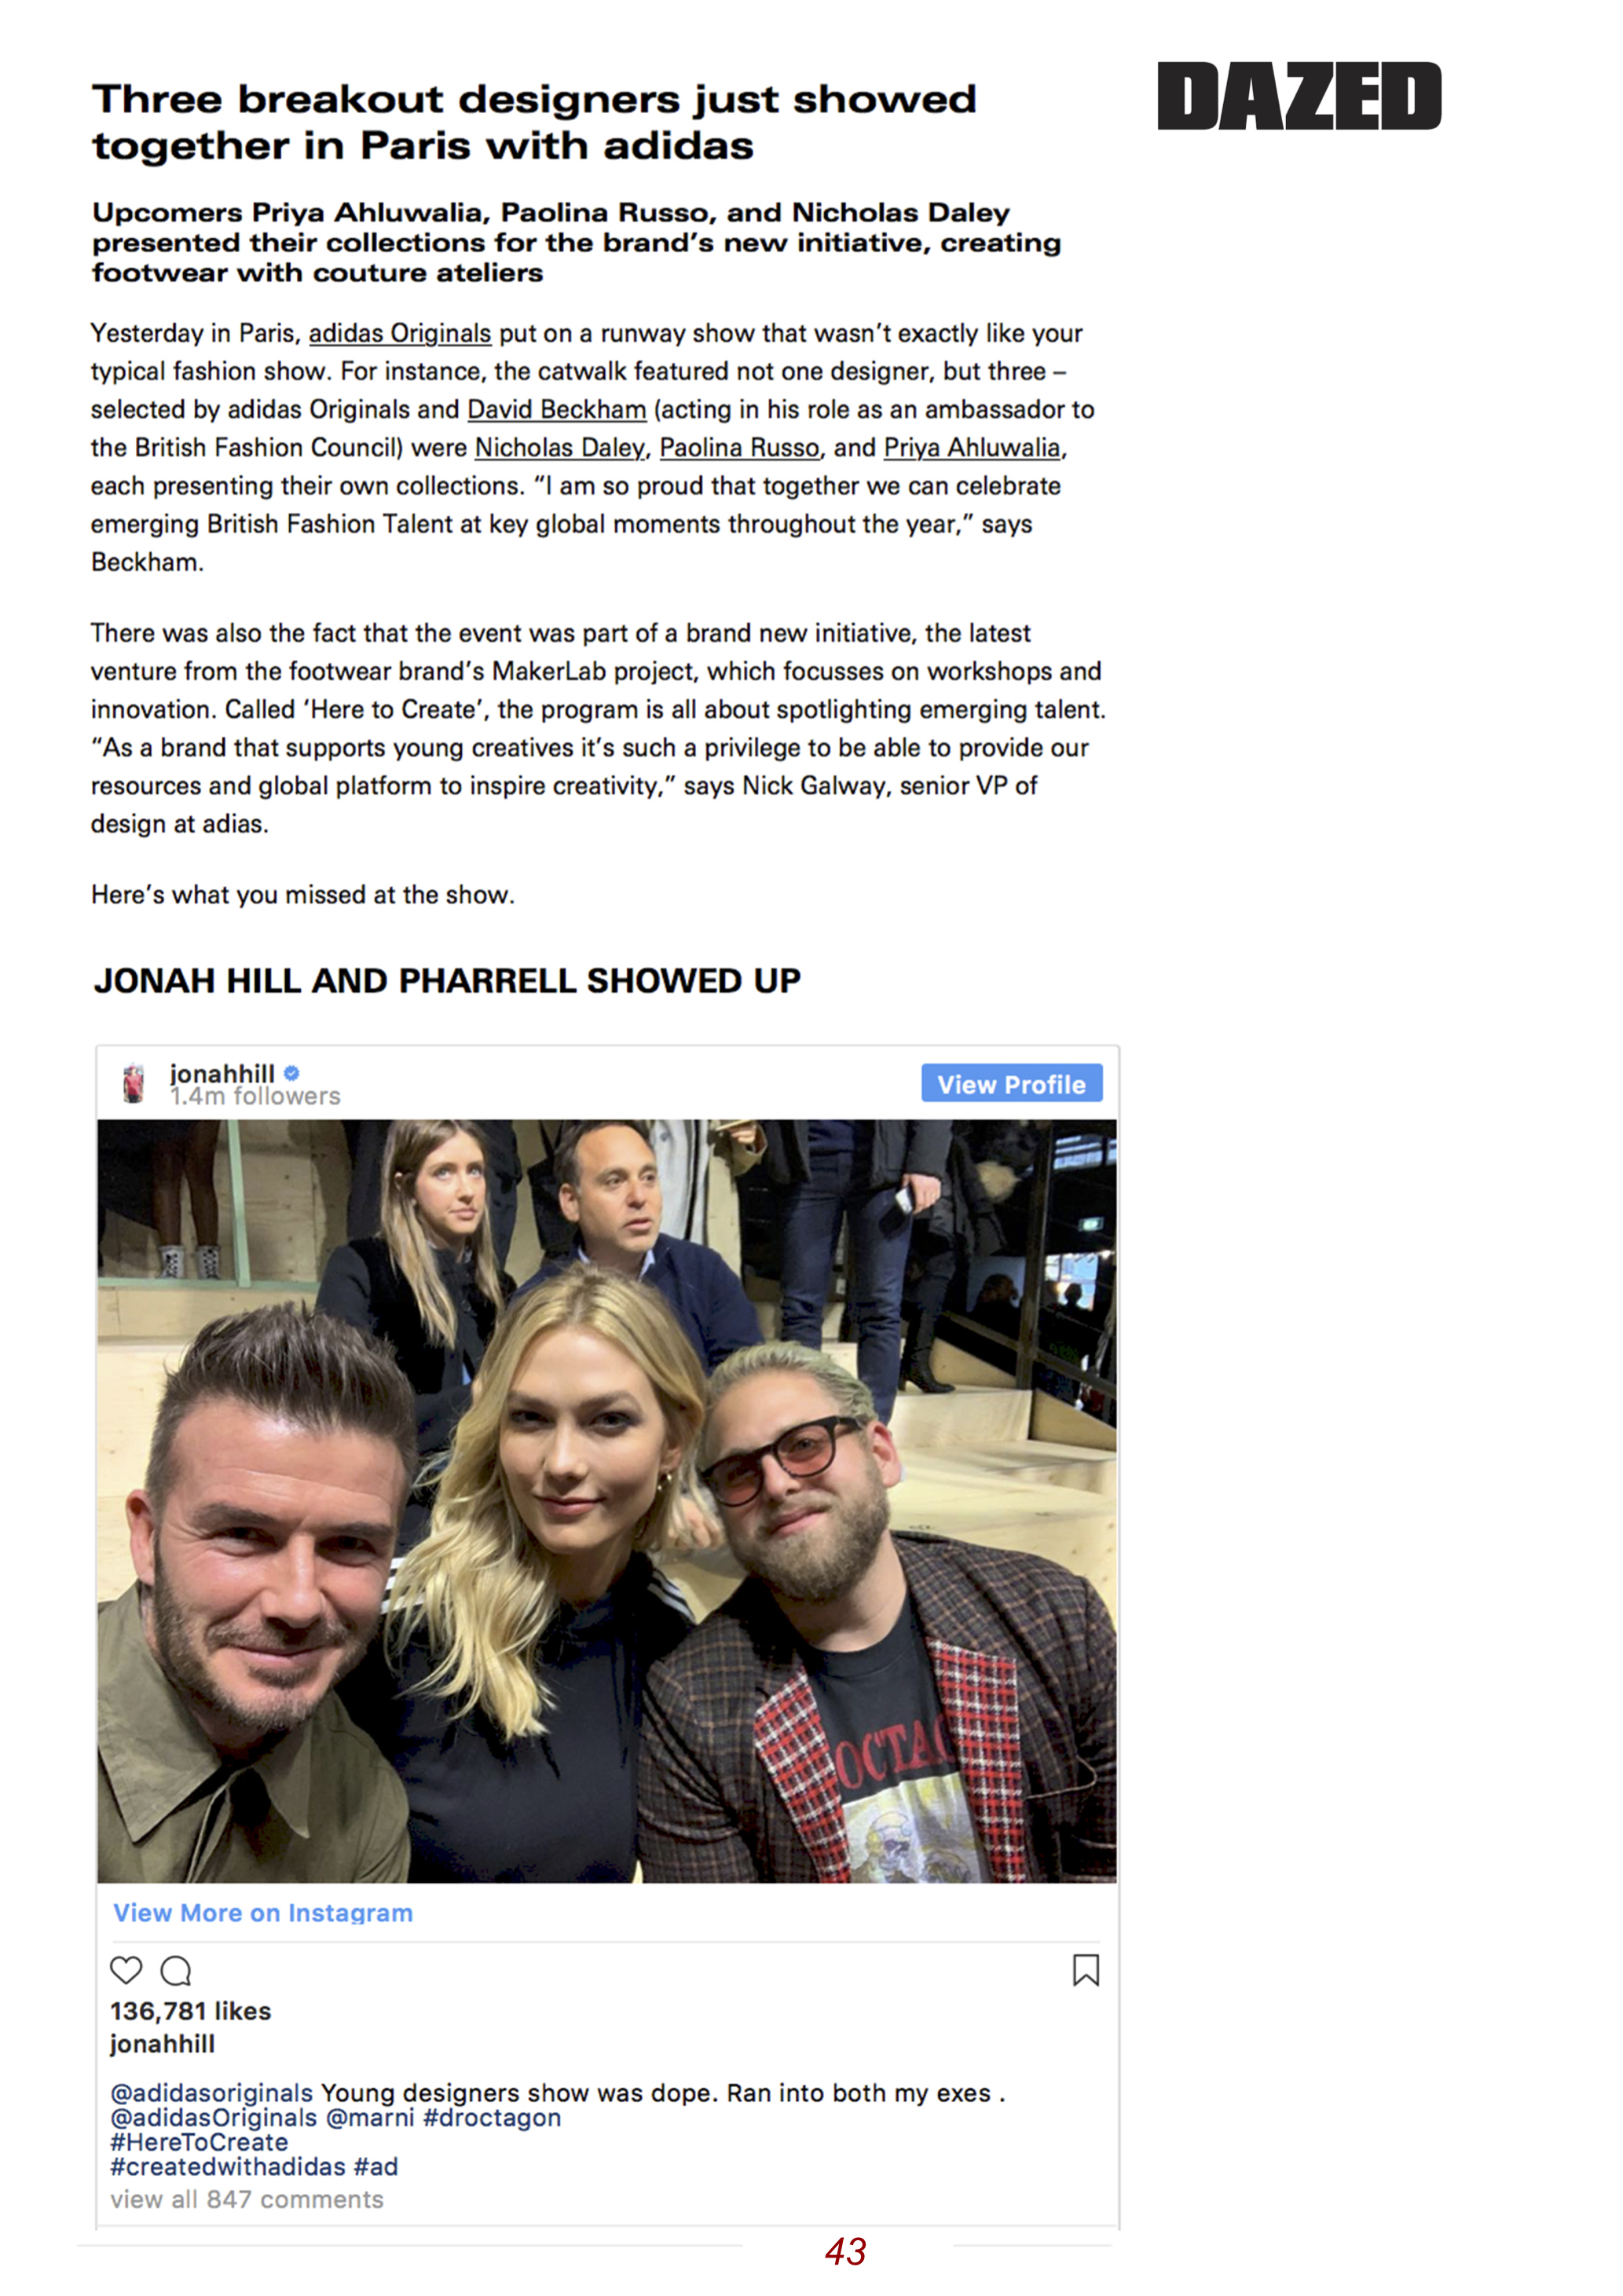 page 43 photo.jpg